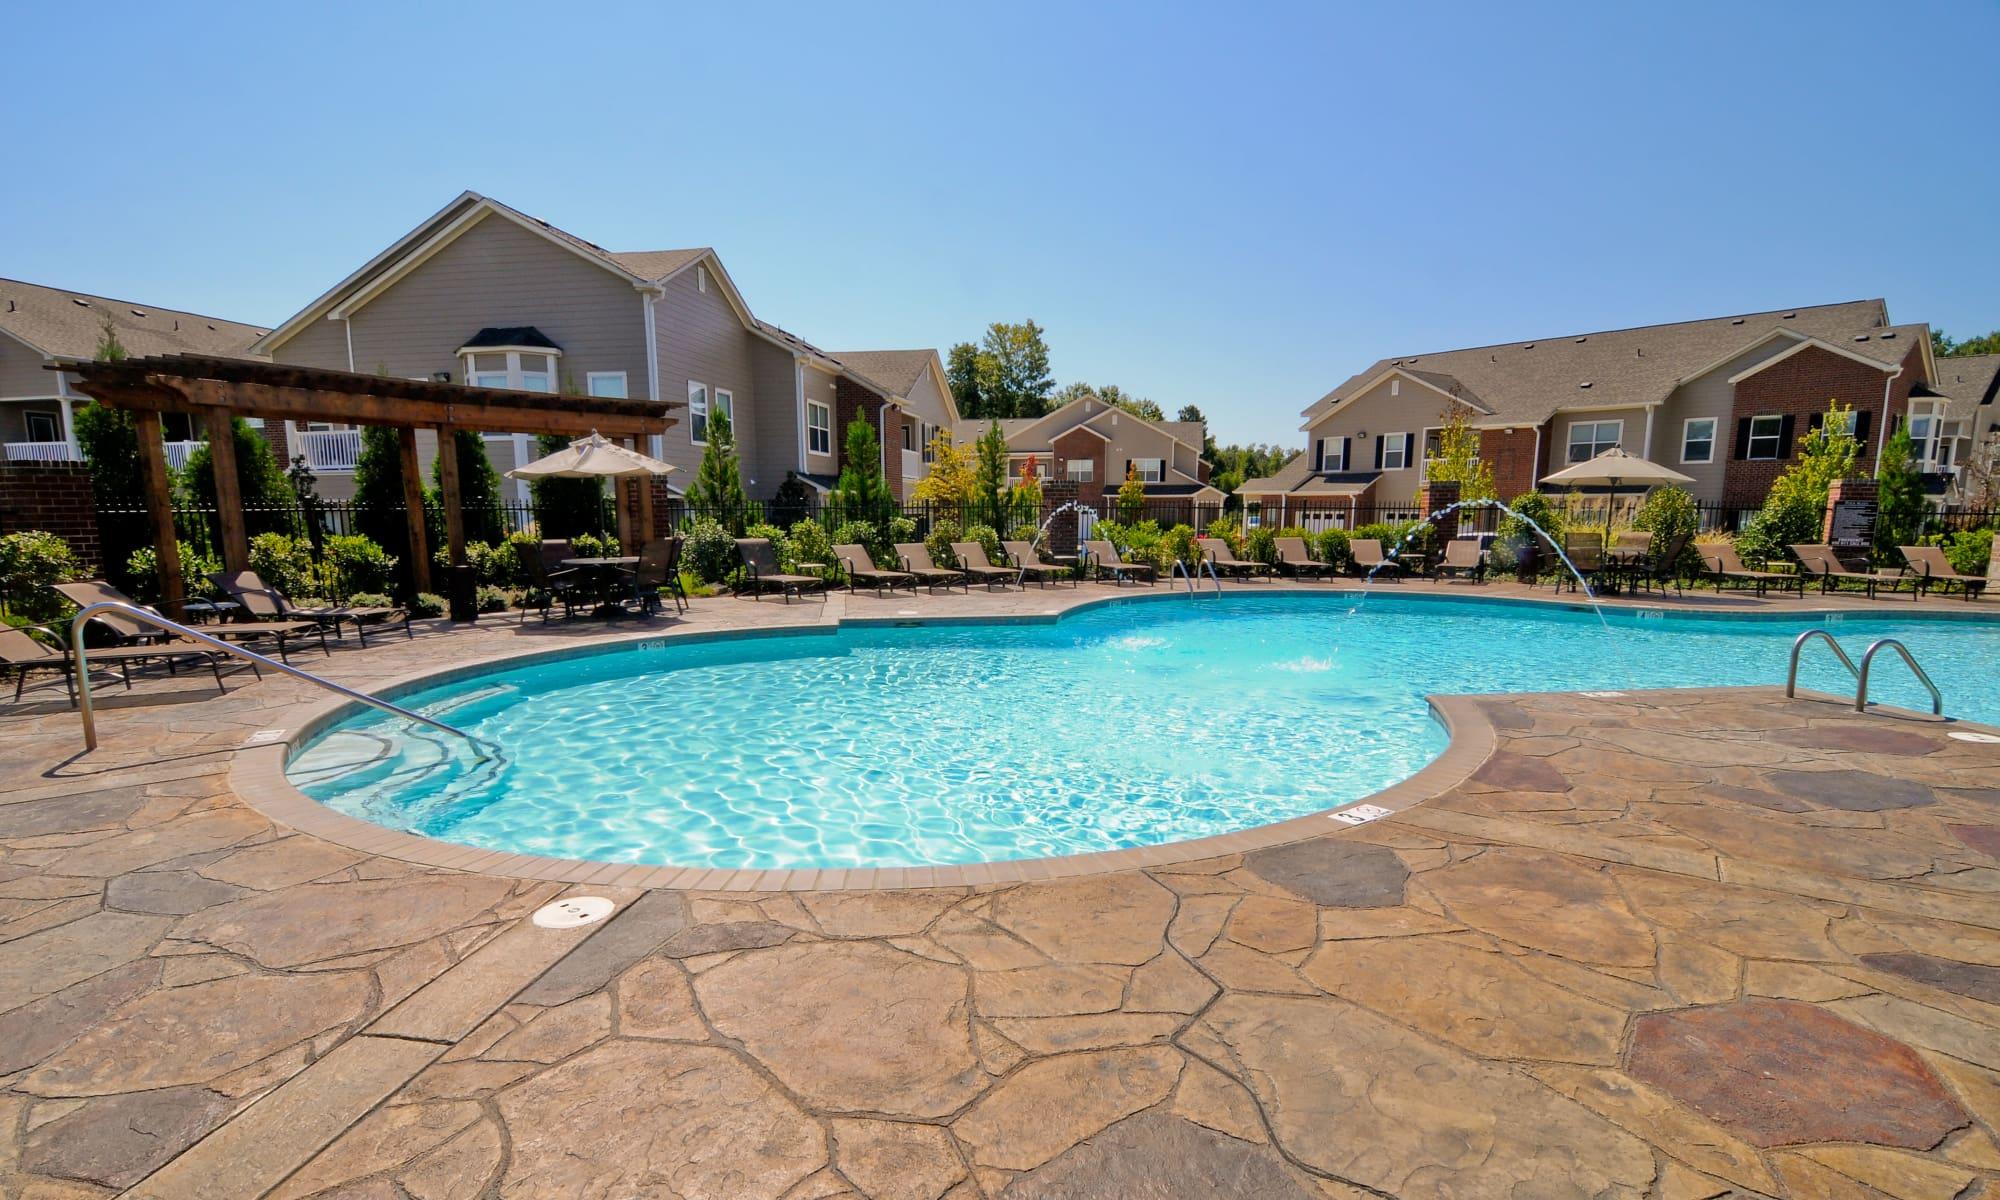 Lenow Cordova Tn Apartments For Rent Near Lakeland